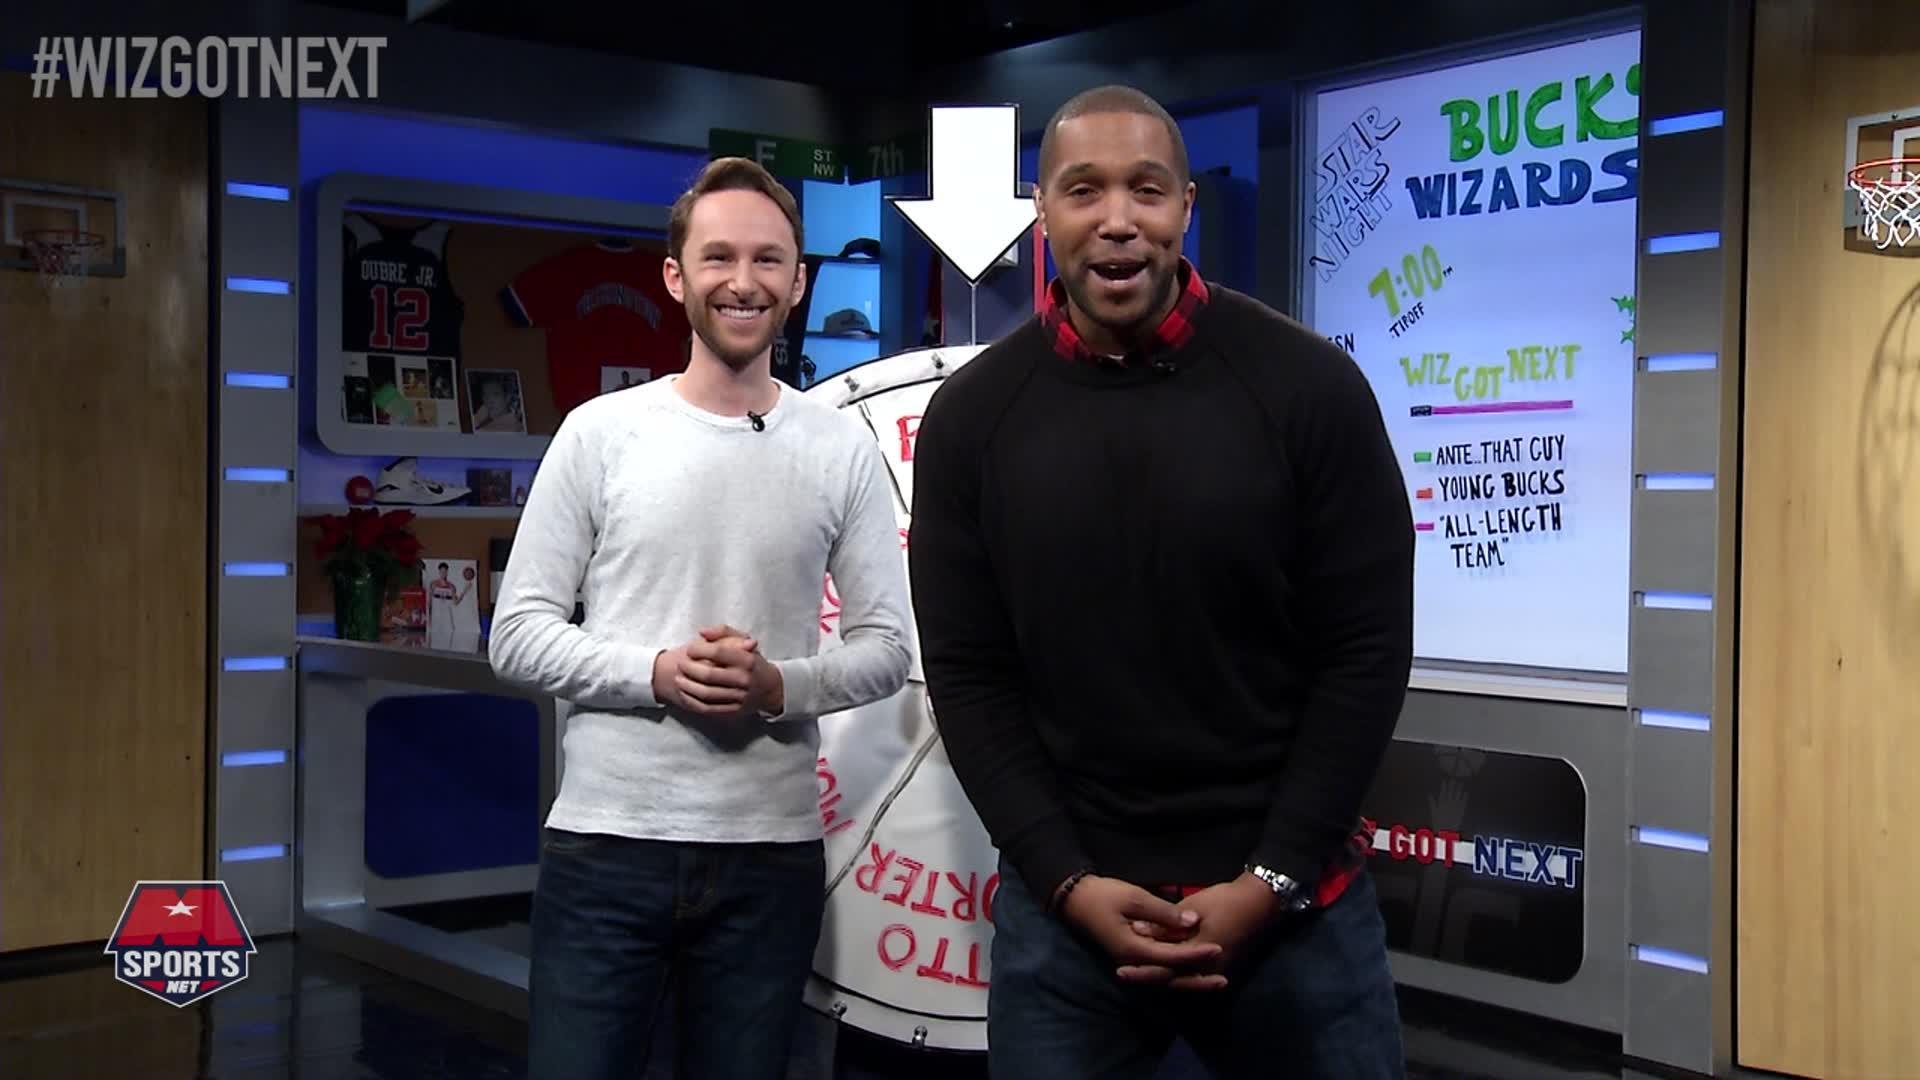 Wiz Got Next: Wiz vs Bucks Pt 2 12-10-16